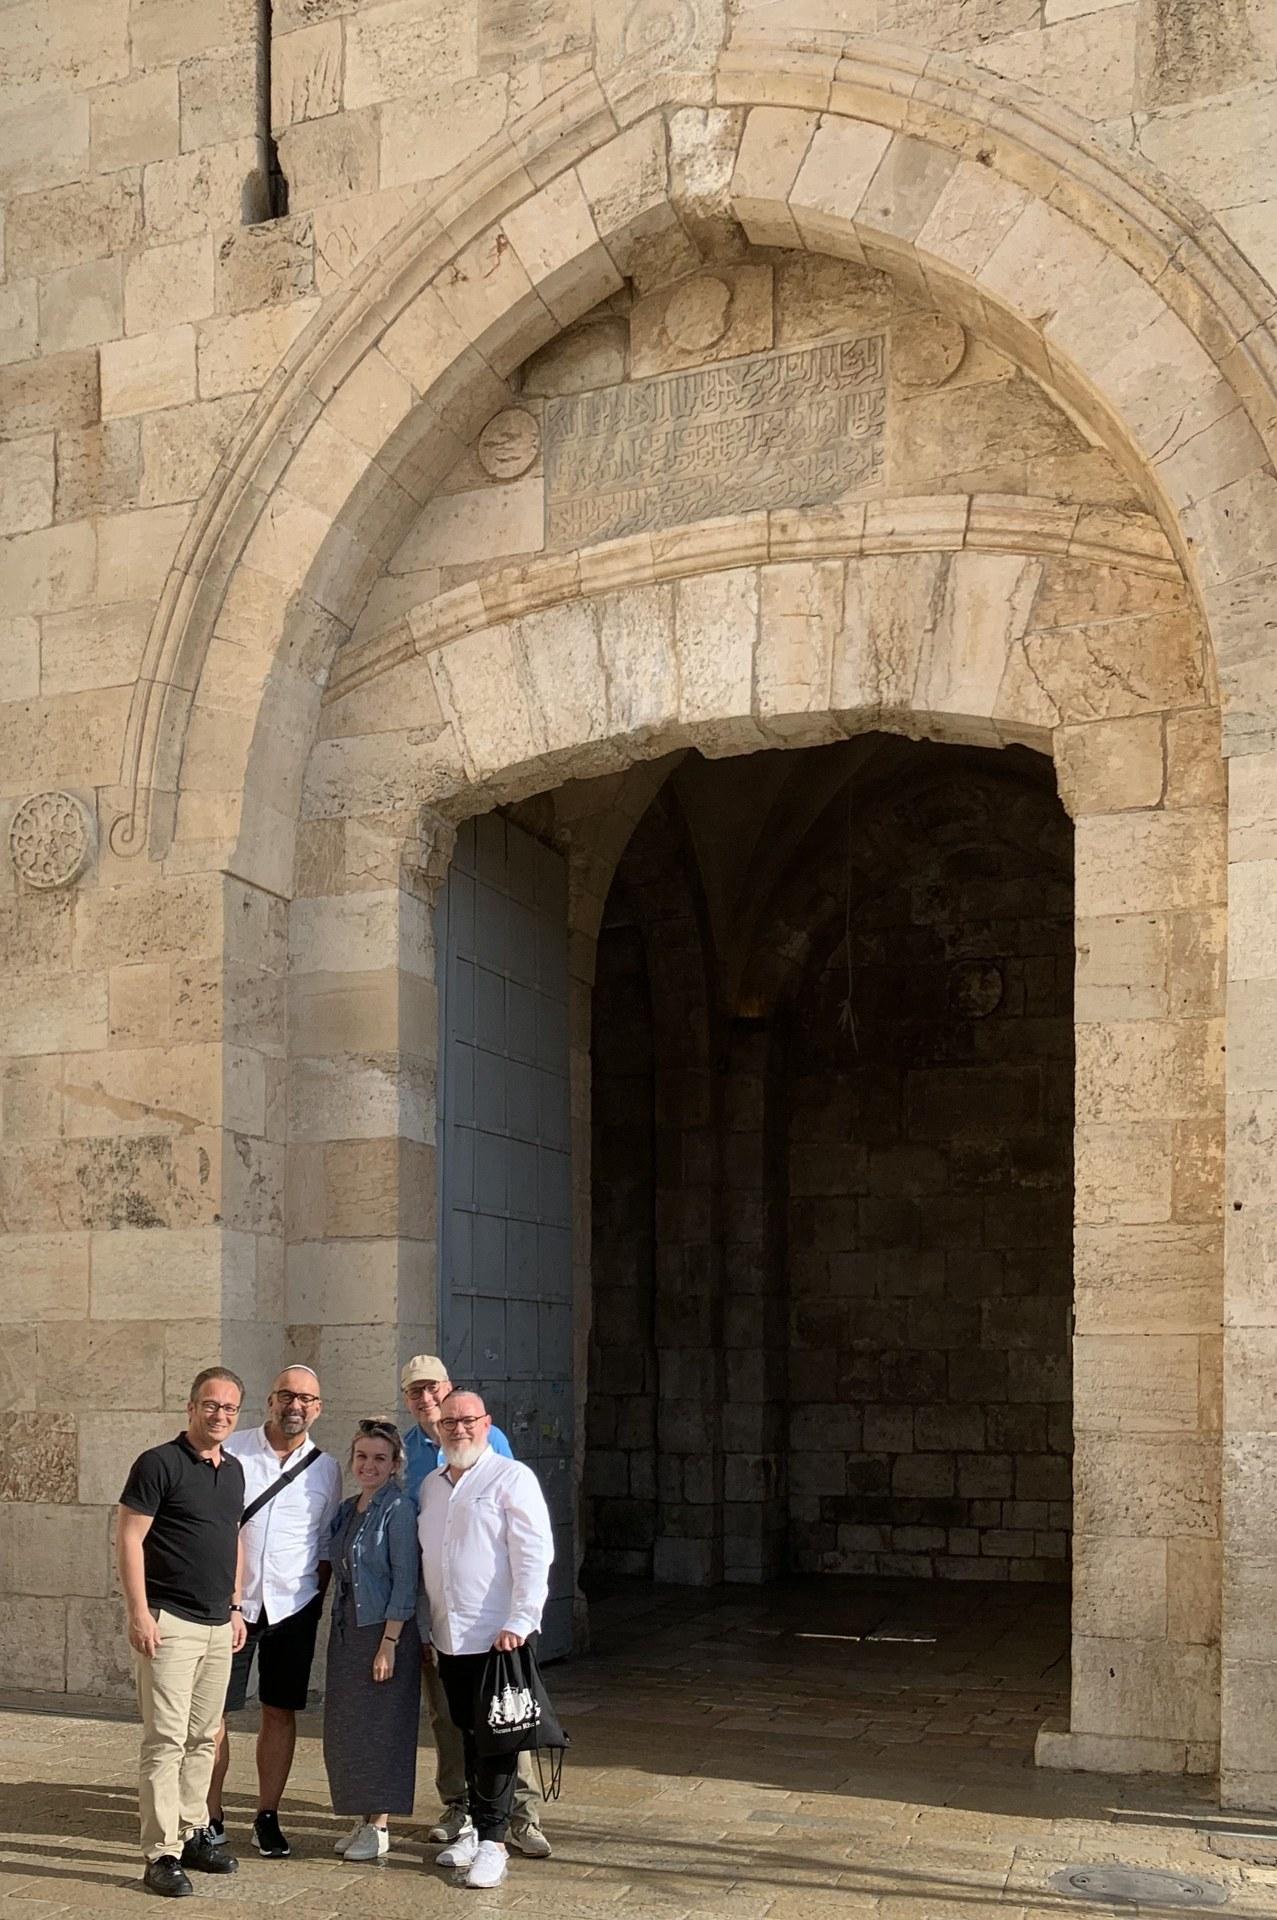 Die Neusser Delegation vor dem Jaffa-Tor in Jerusalem (v.l.) Bürgermeister Reiner Breuer, Bert Römgens, Jessica Gleß, Frank Gensler und Richard Palermo.jpg